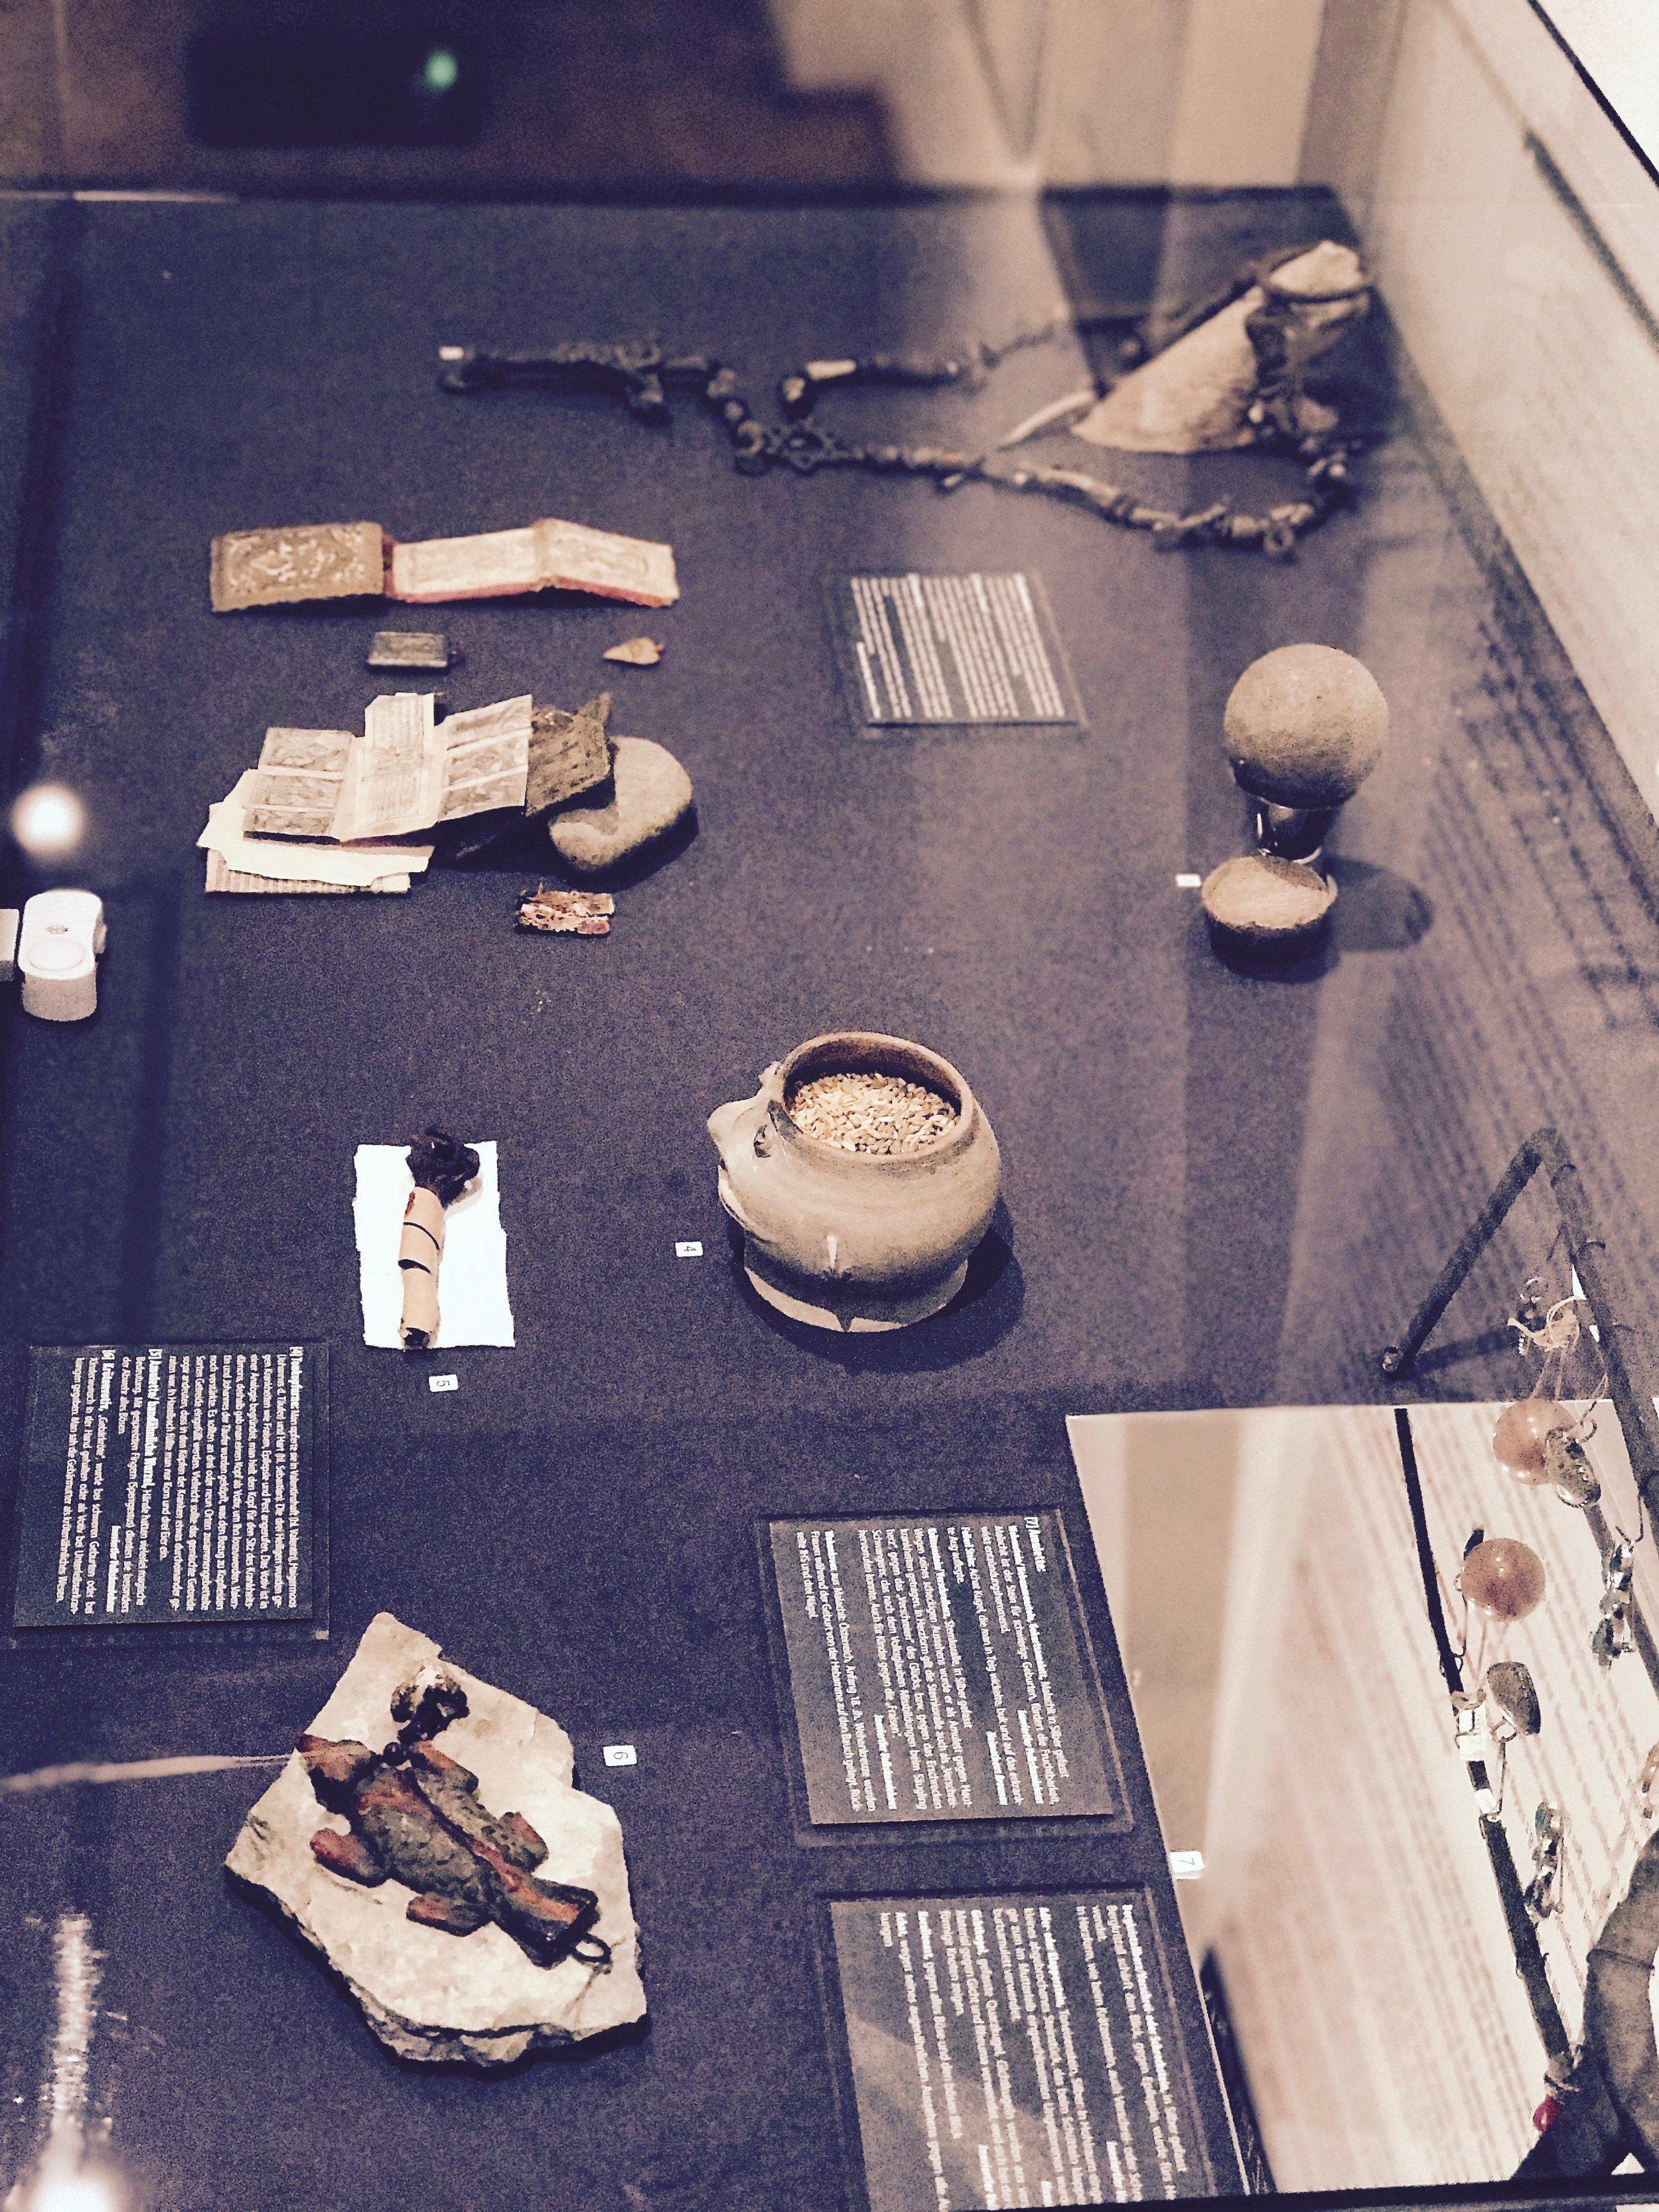 assorted votive offerings